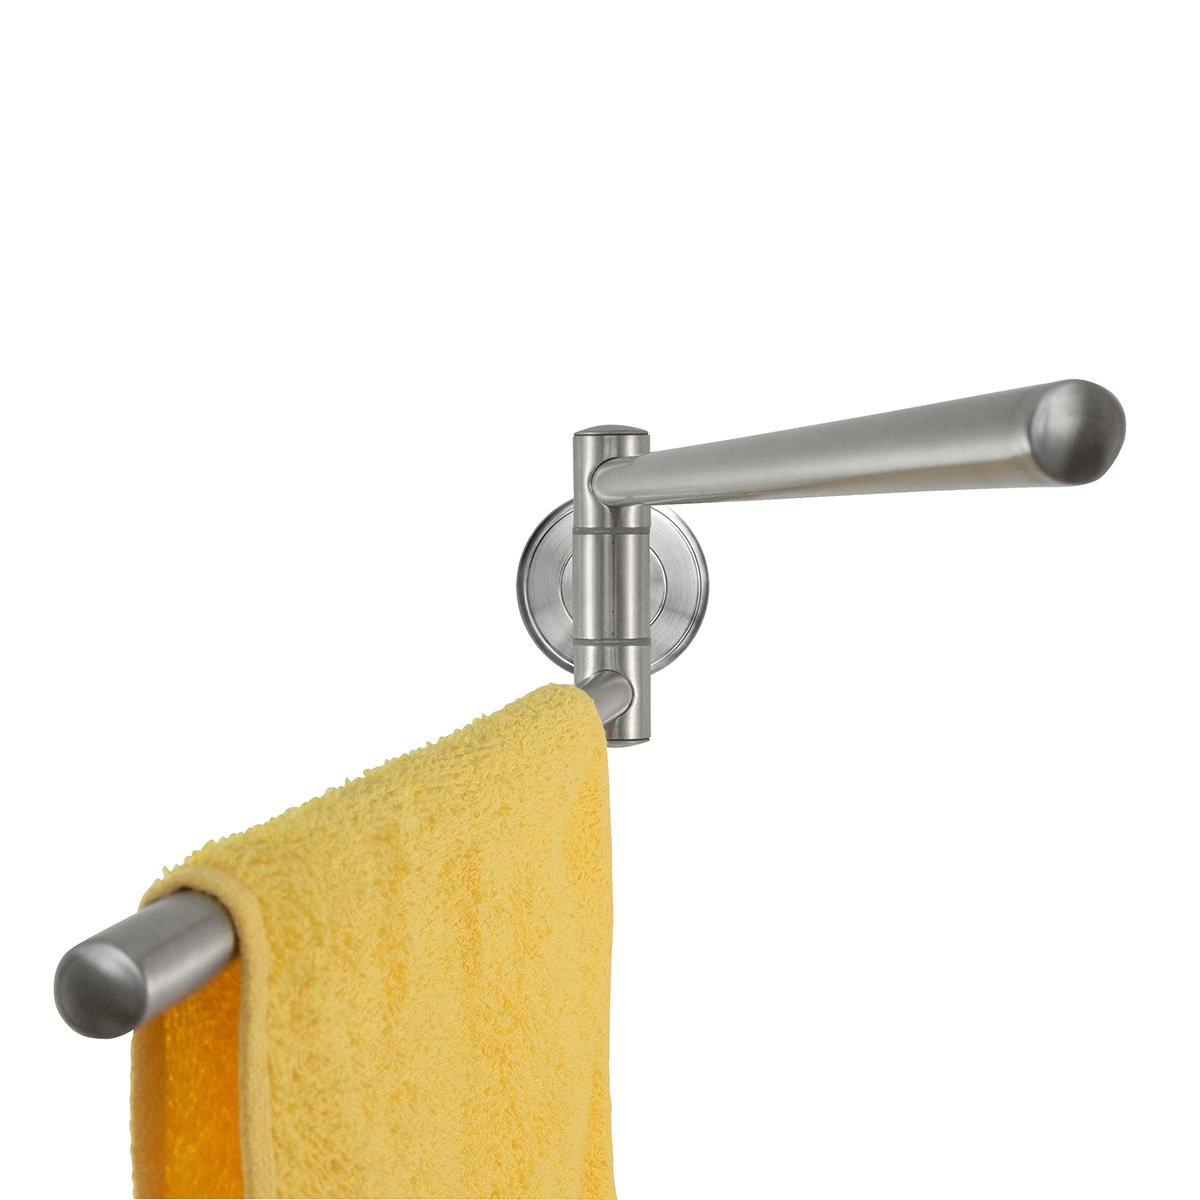 badserie ambiente toilettenpapierhalter klopapierhalter wand edelstahl ebay. Black Bedroom Furniture Sets. Home Design Ideas